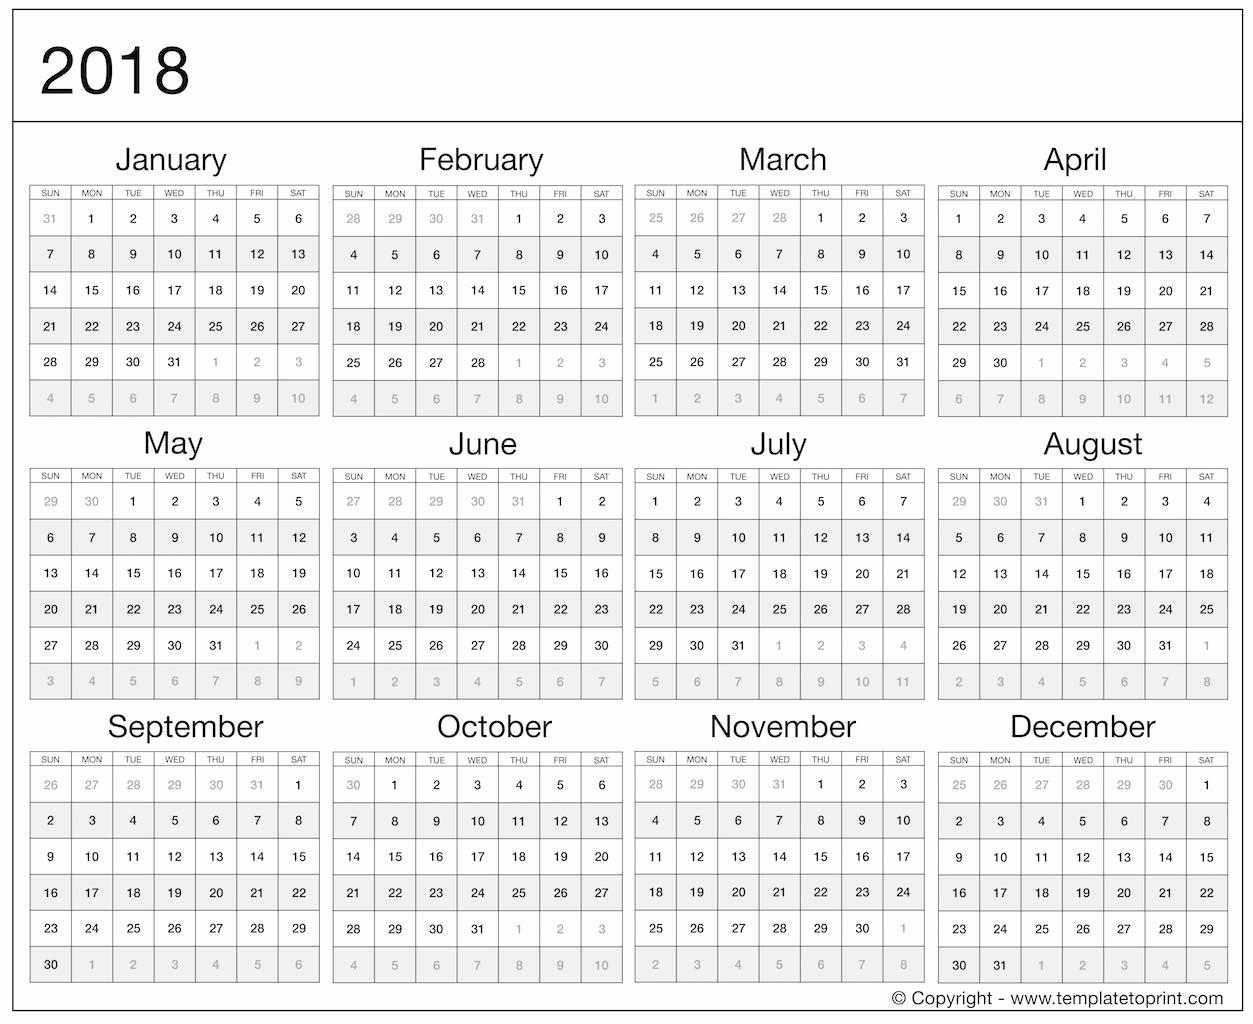 2020 Julian Calendar Printable Pdf